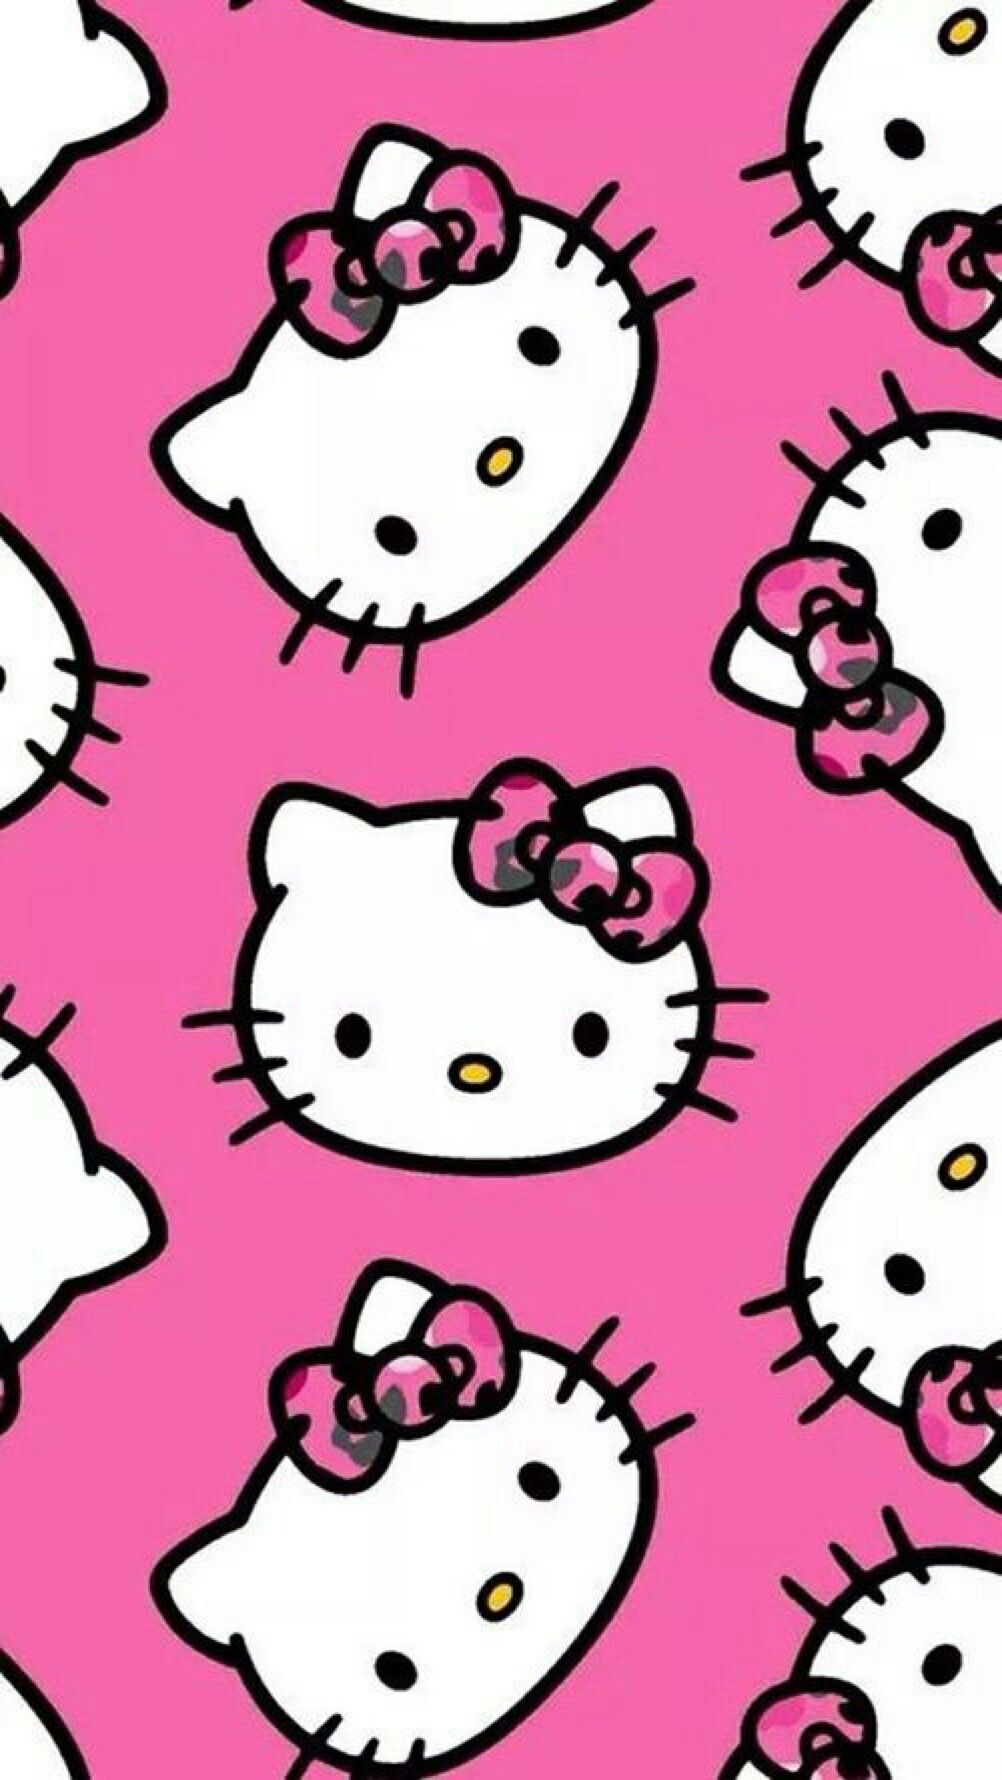 Hello Kitty Hello Kitty Wallpaper Hello Kitty Pictures Hello Kitty Backgrounds